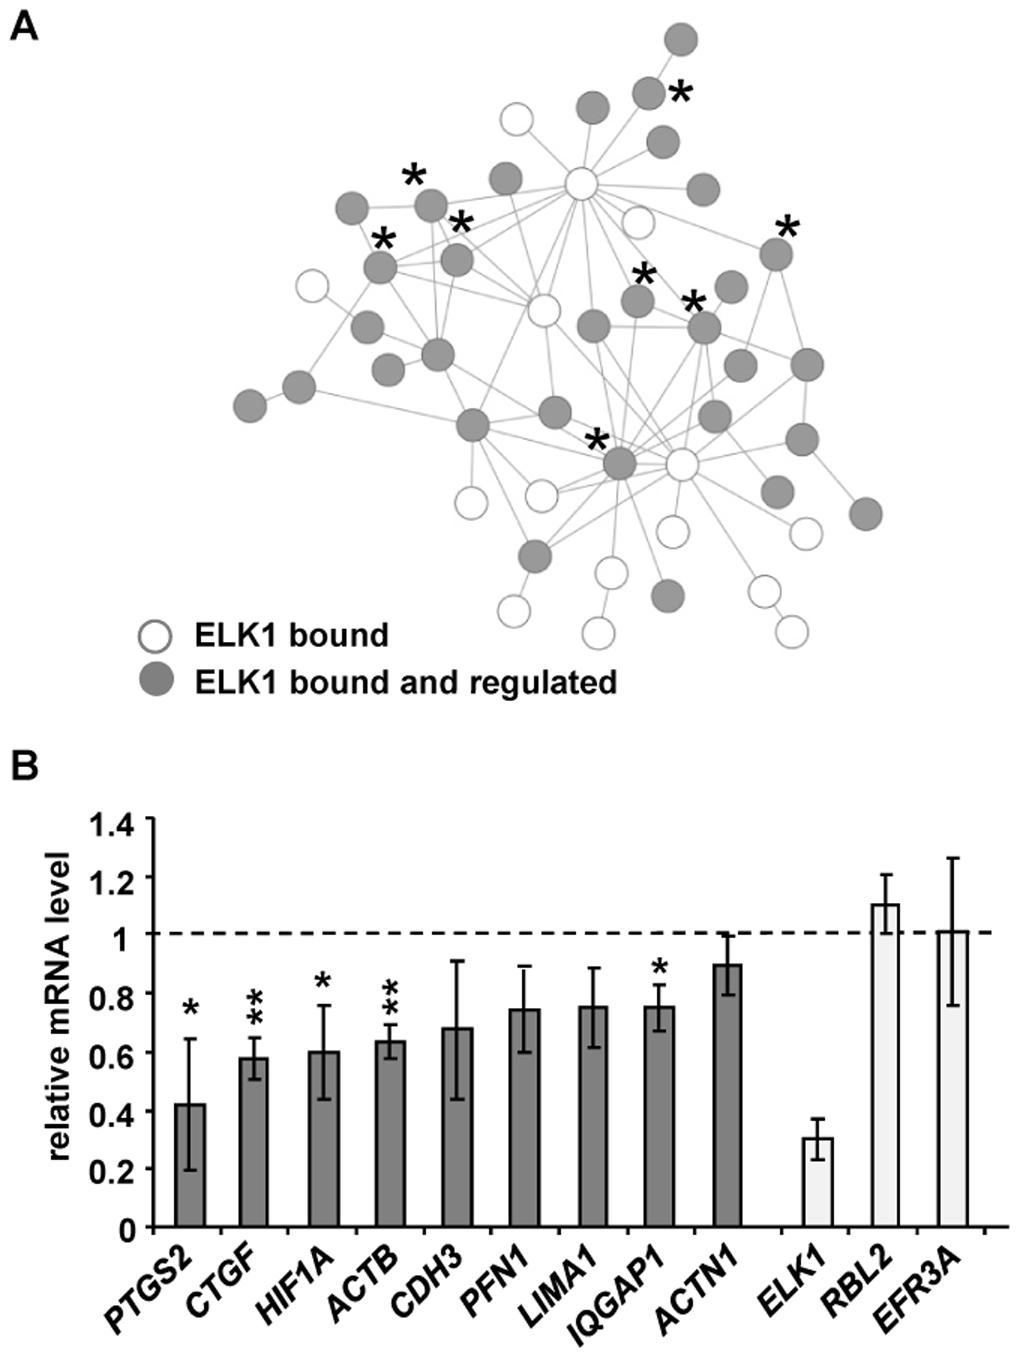 ELK1 controls a network of actin/migration-related genes.